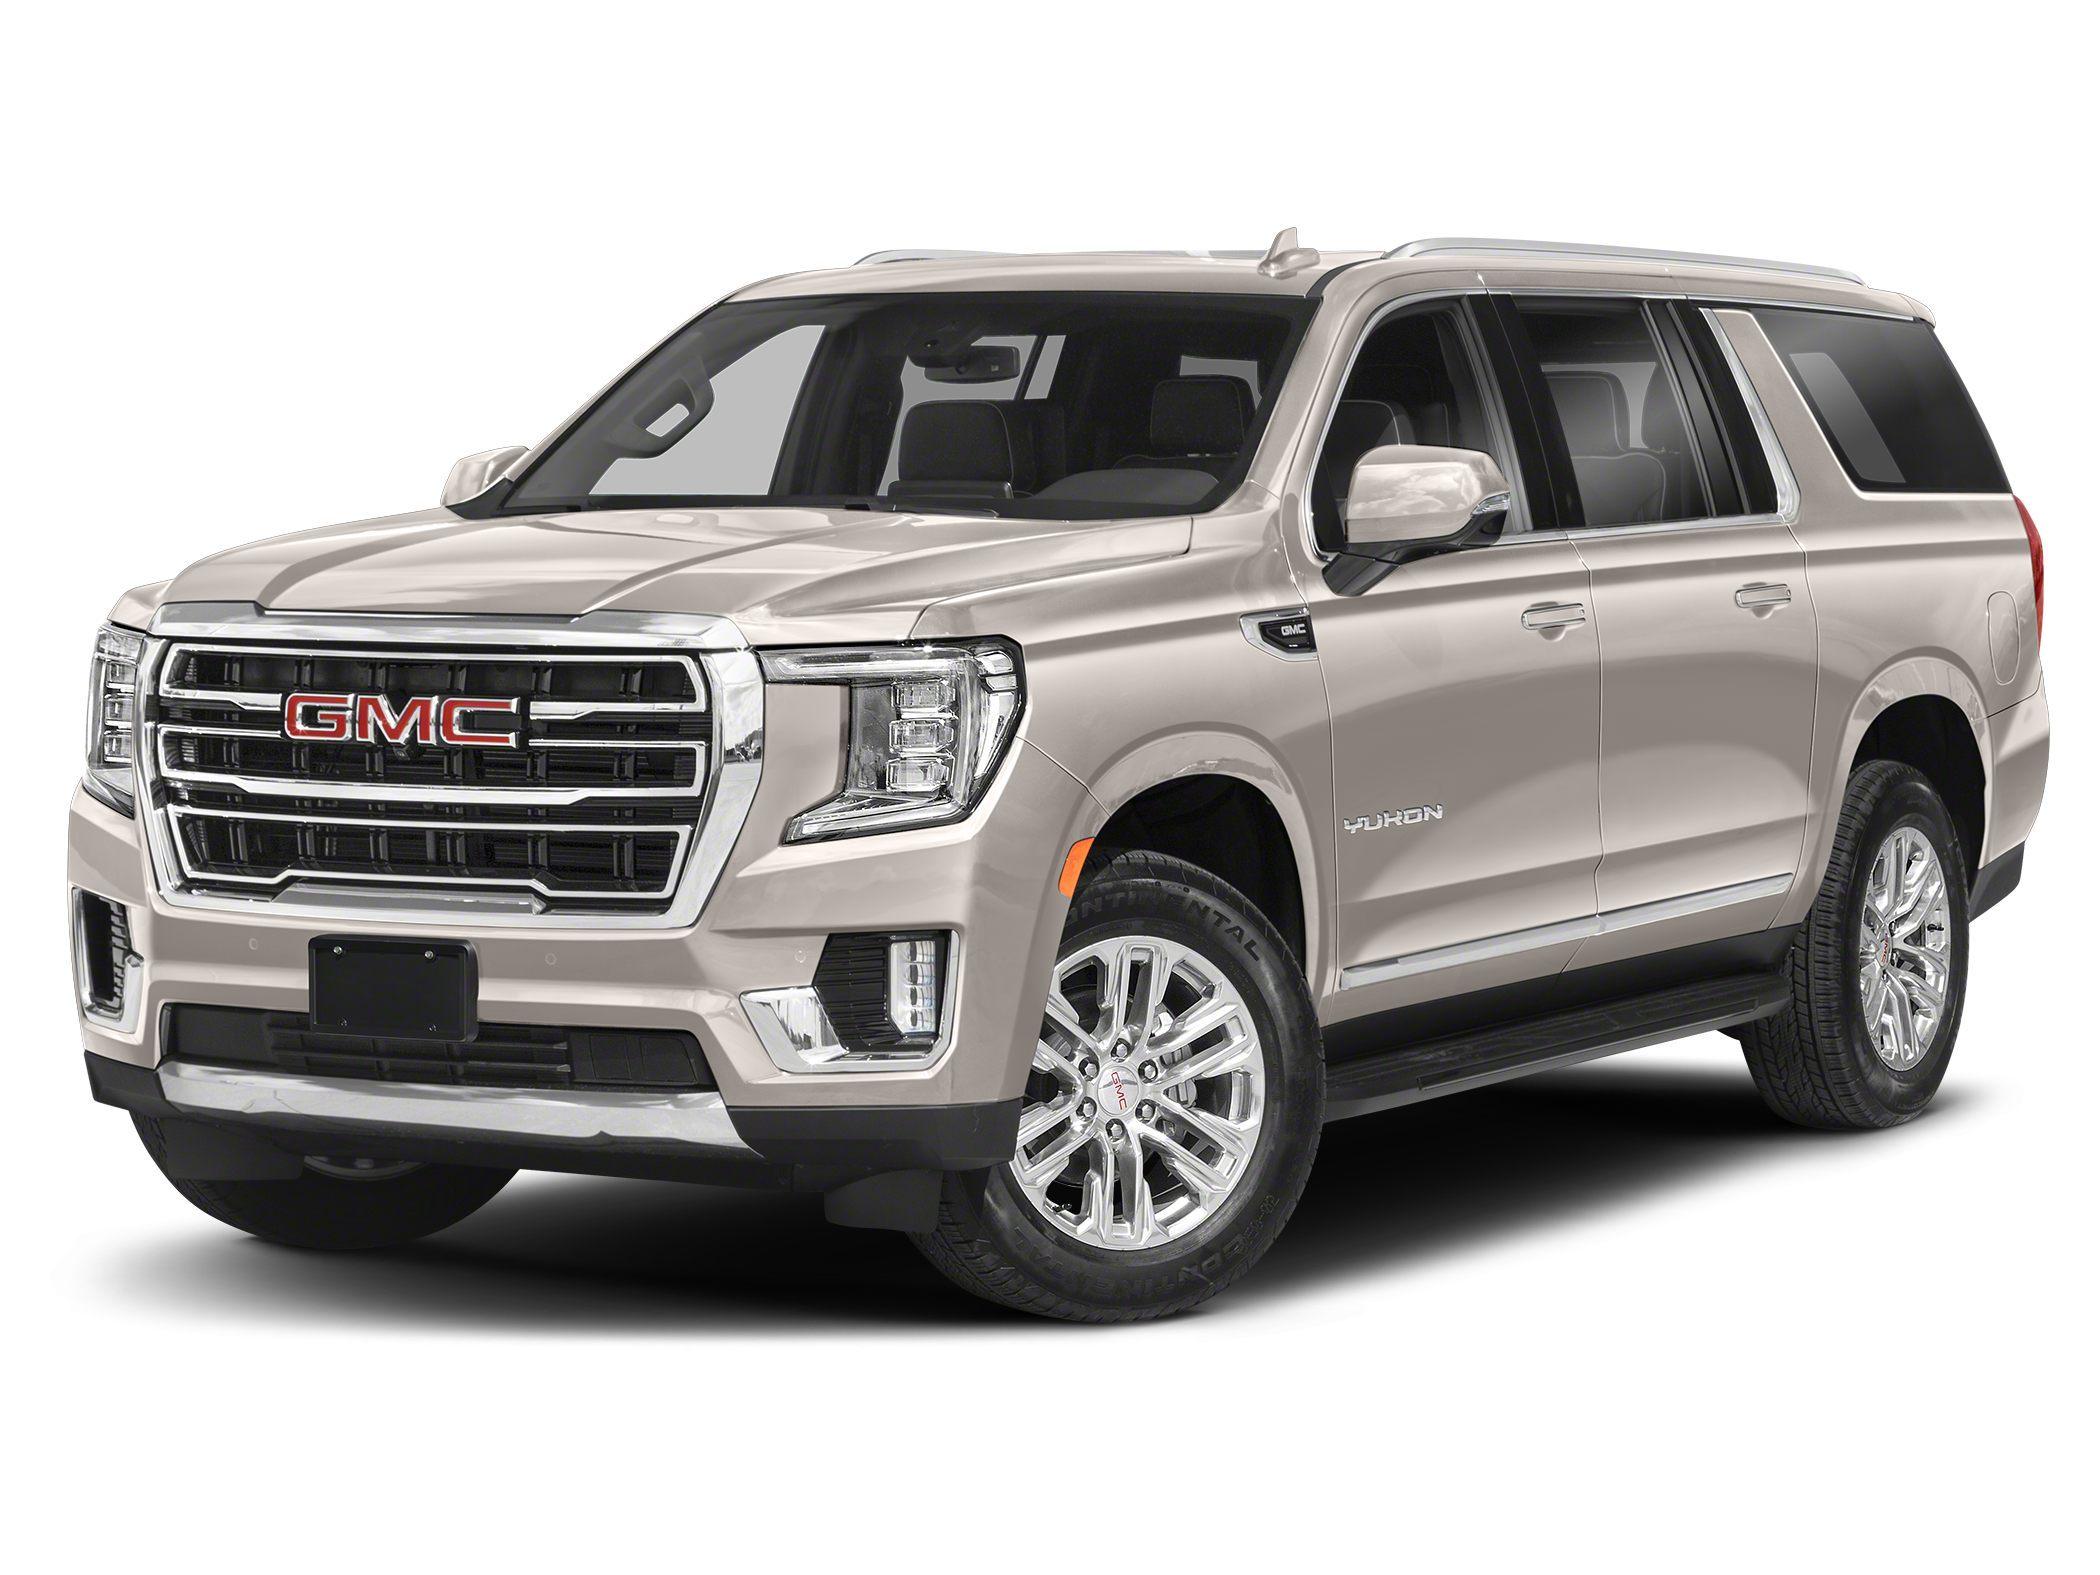 New 2021 Gmc Yukon Xl For Sale In Galesburg Il 1gks2jklxmr255955